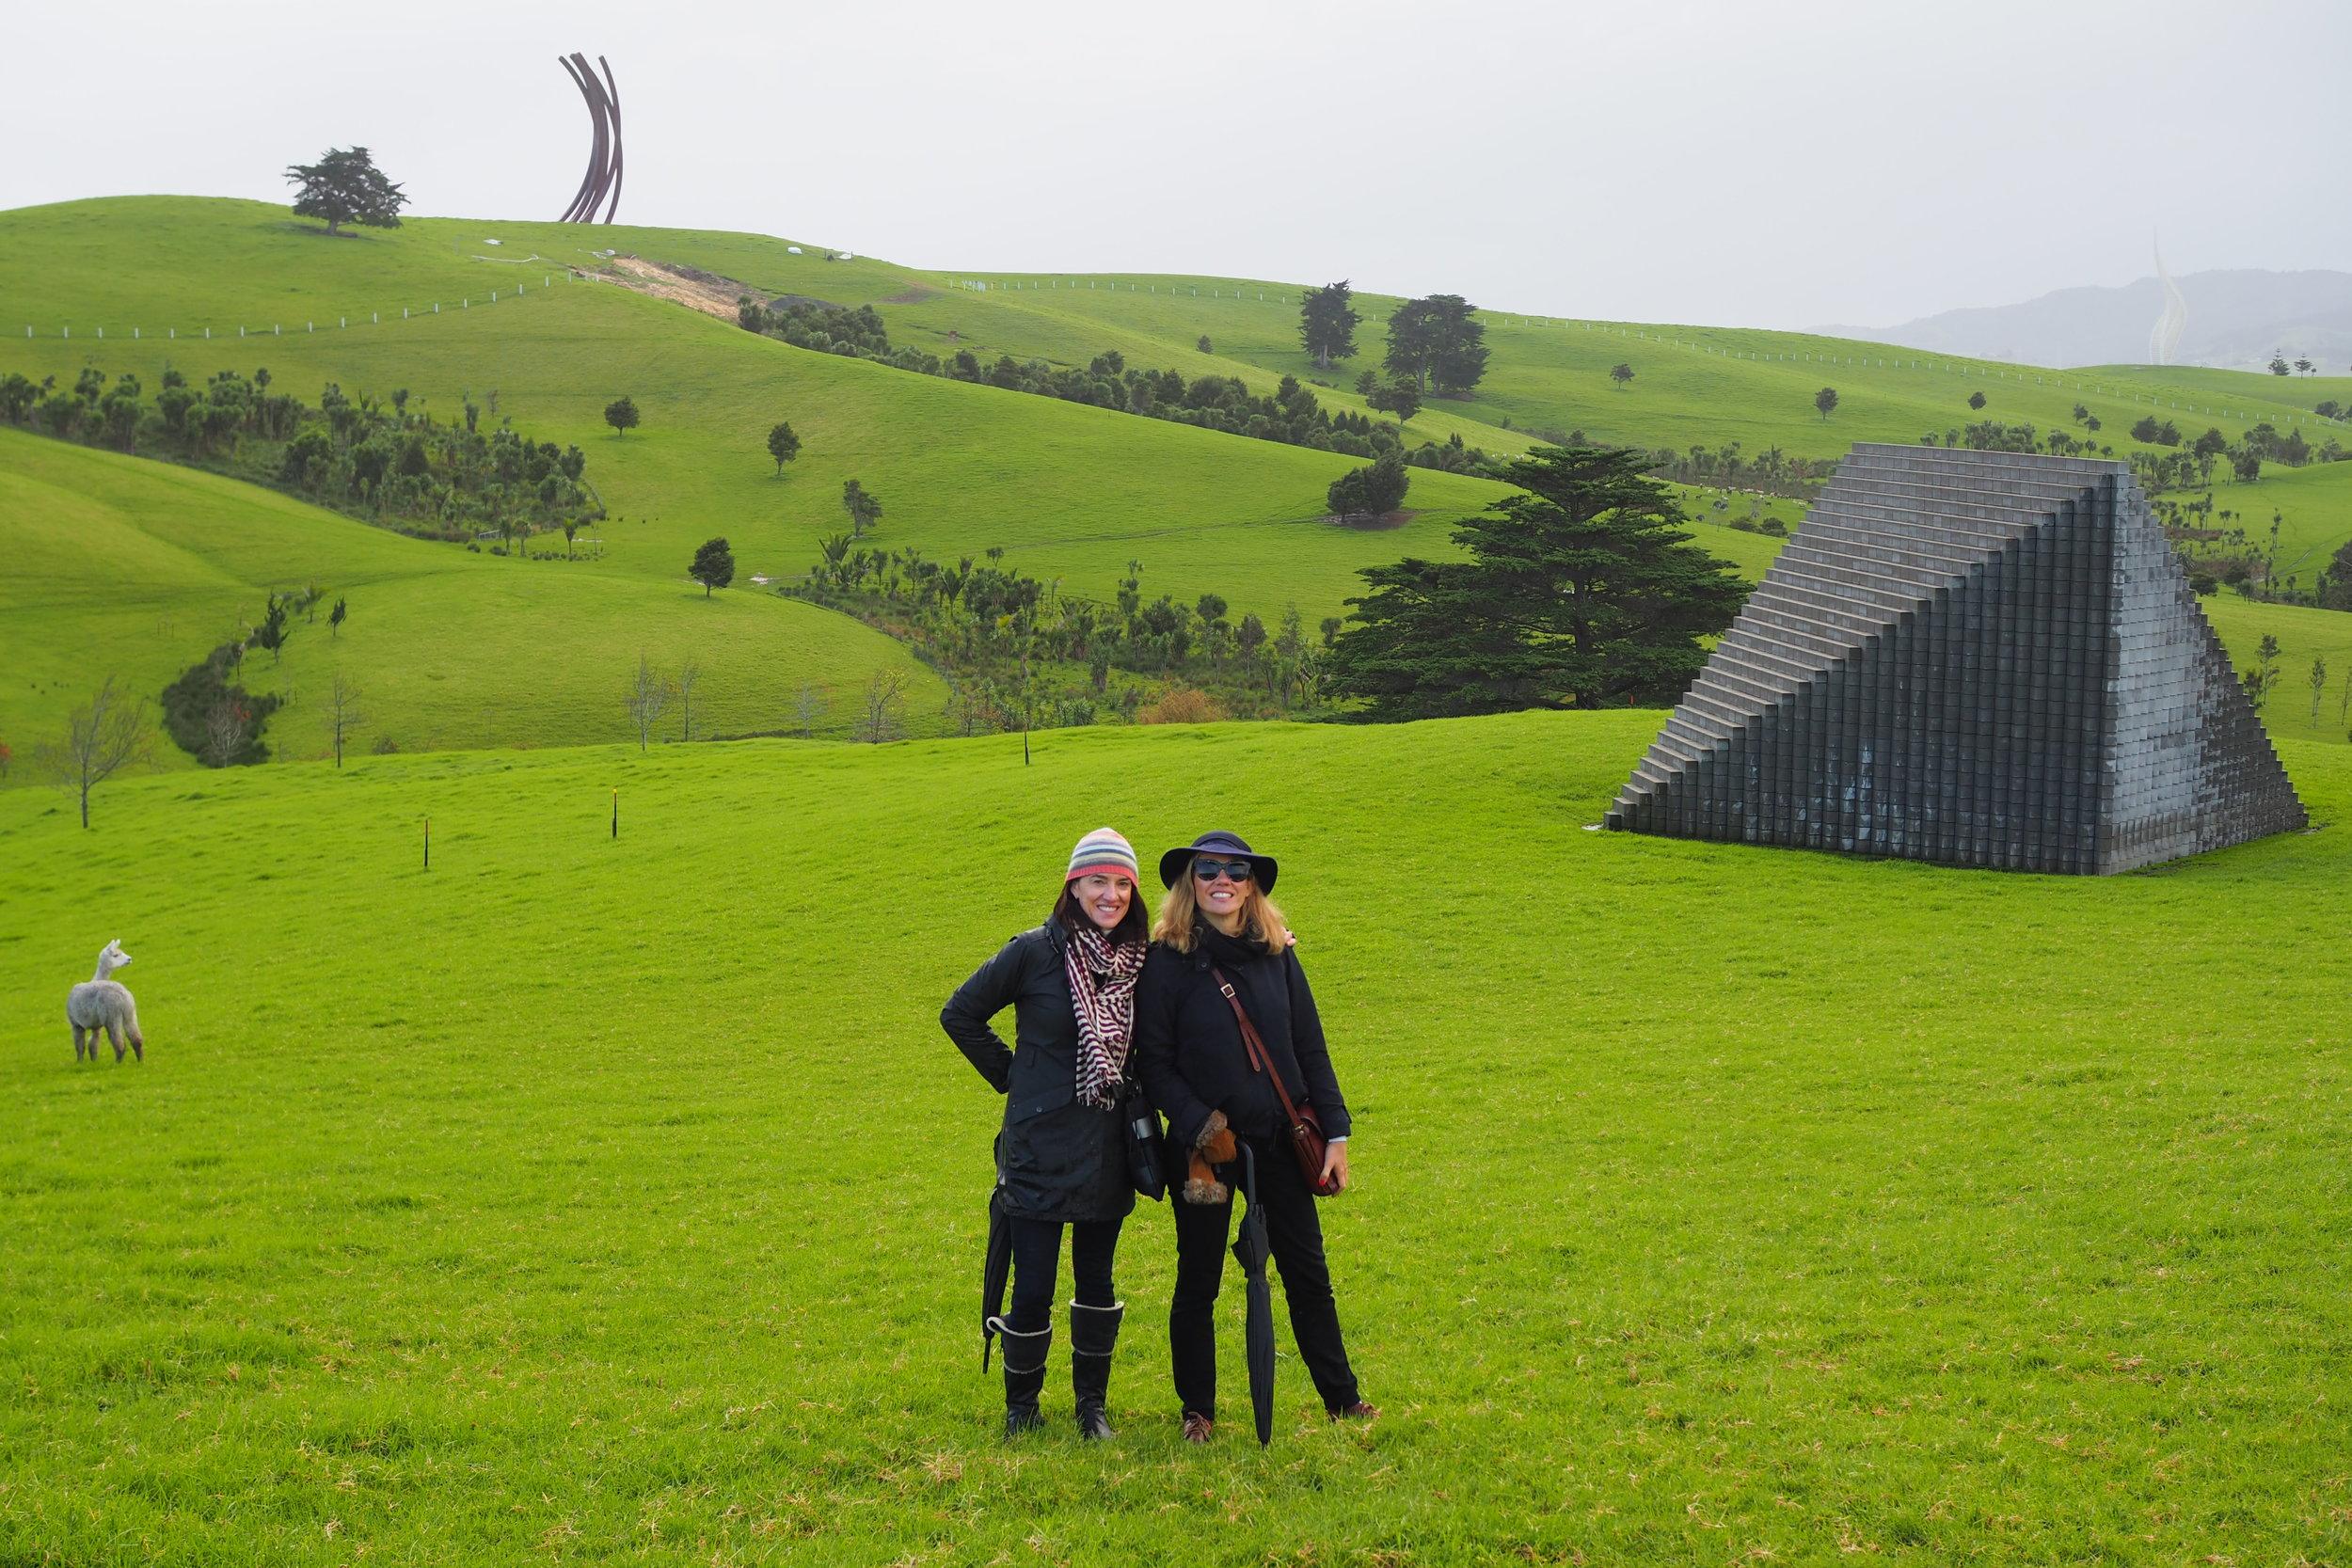 Culture Scouts braved the crisp cold to explore the sculptural wonderland.